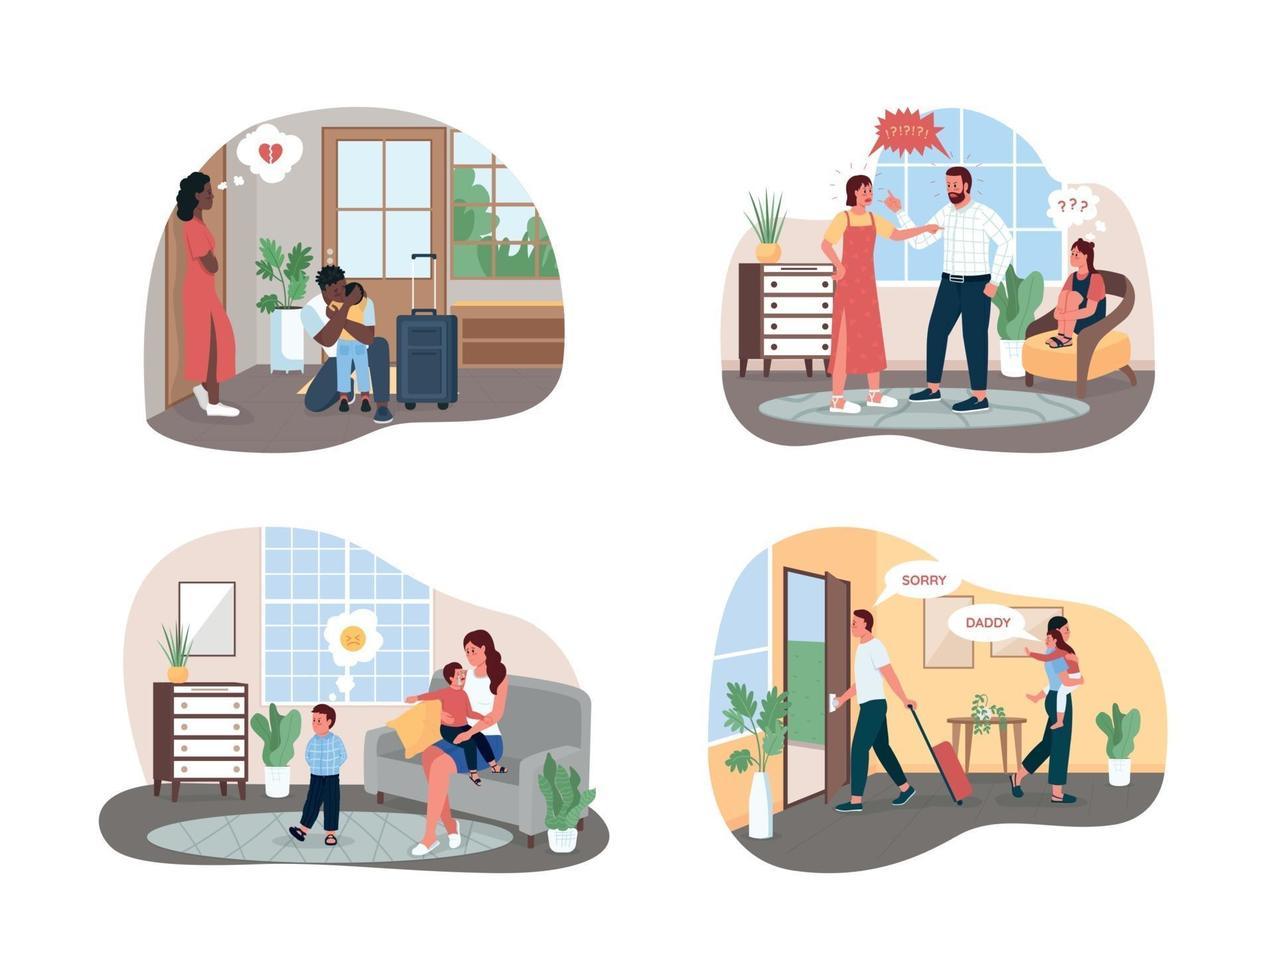 banner web de vetor 2d conflito familiar, conjunto de cartaz